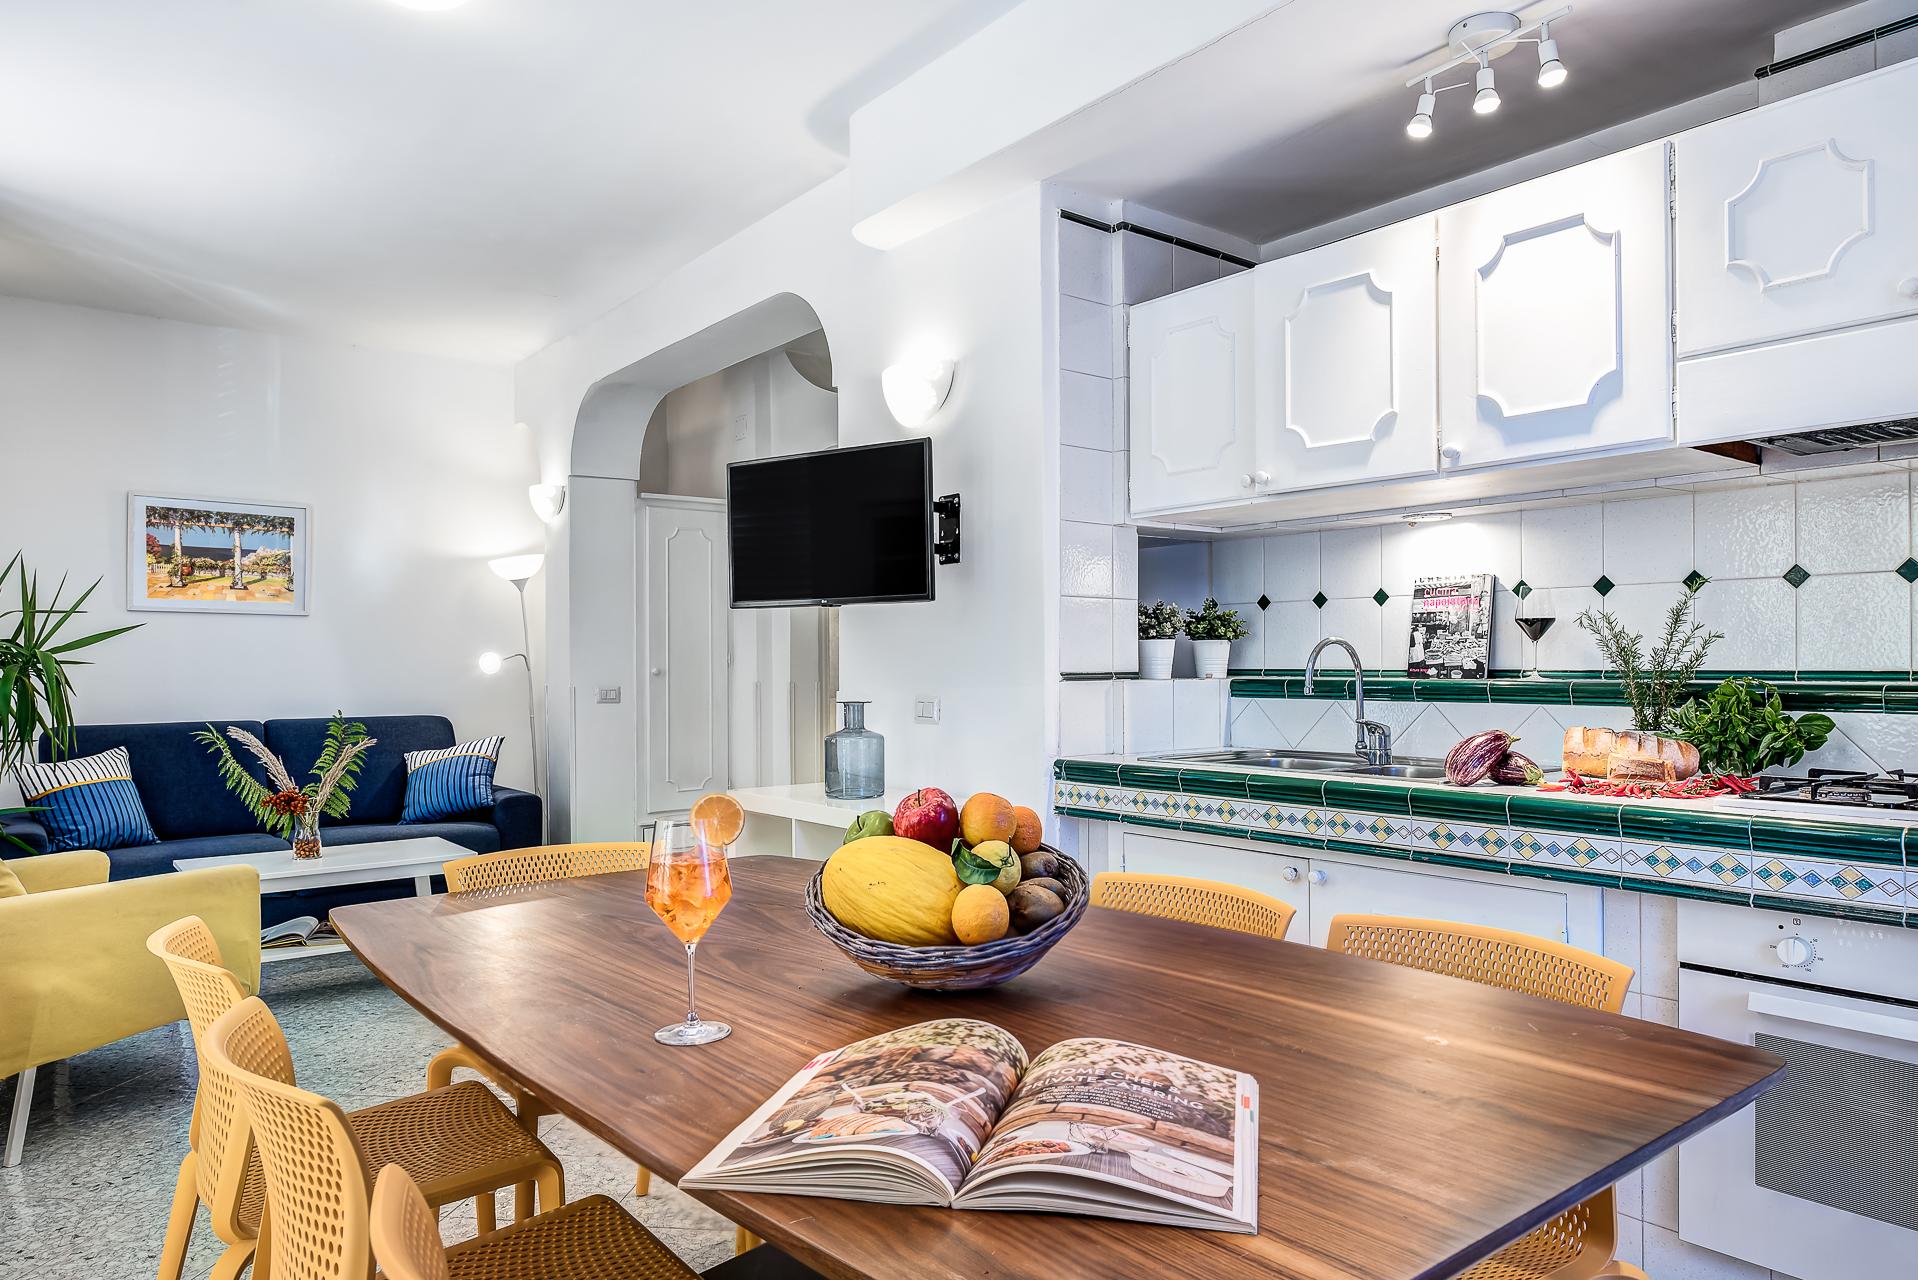 gocce di capri three bedroom apatment classic sorrento kitchen